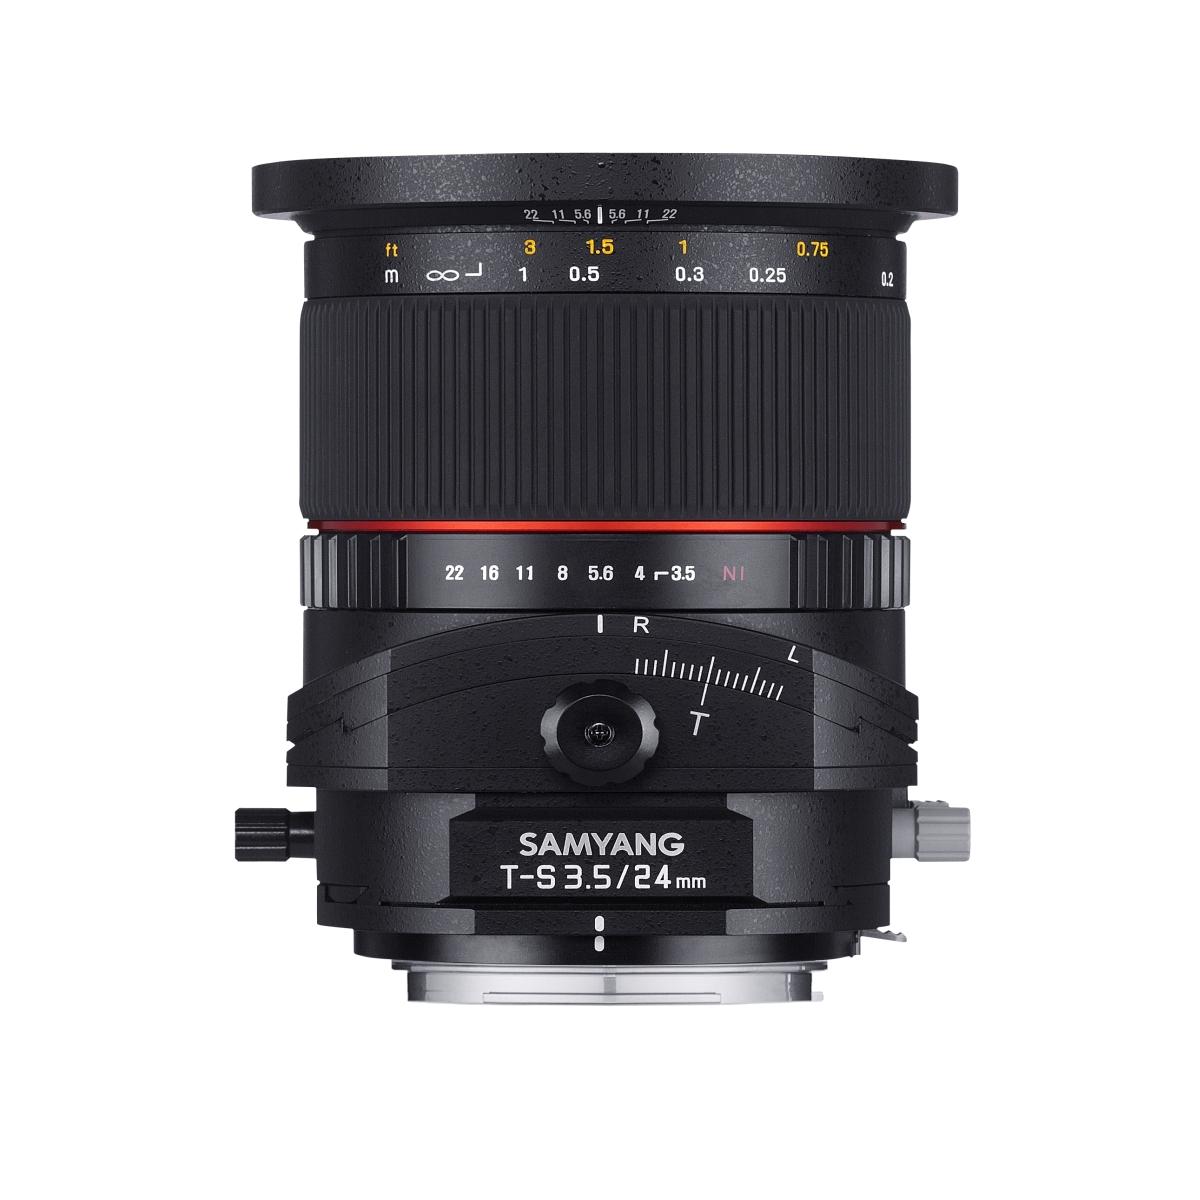 Samyang Tilt-Shift 24 mm 1:3,5 für Nikon F